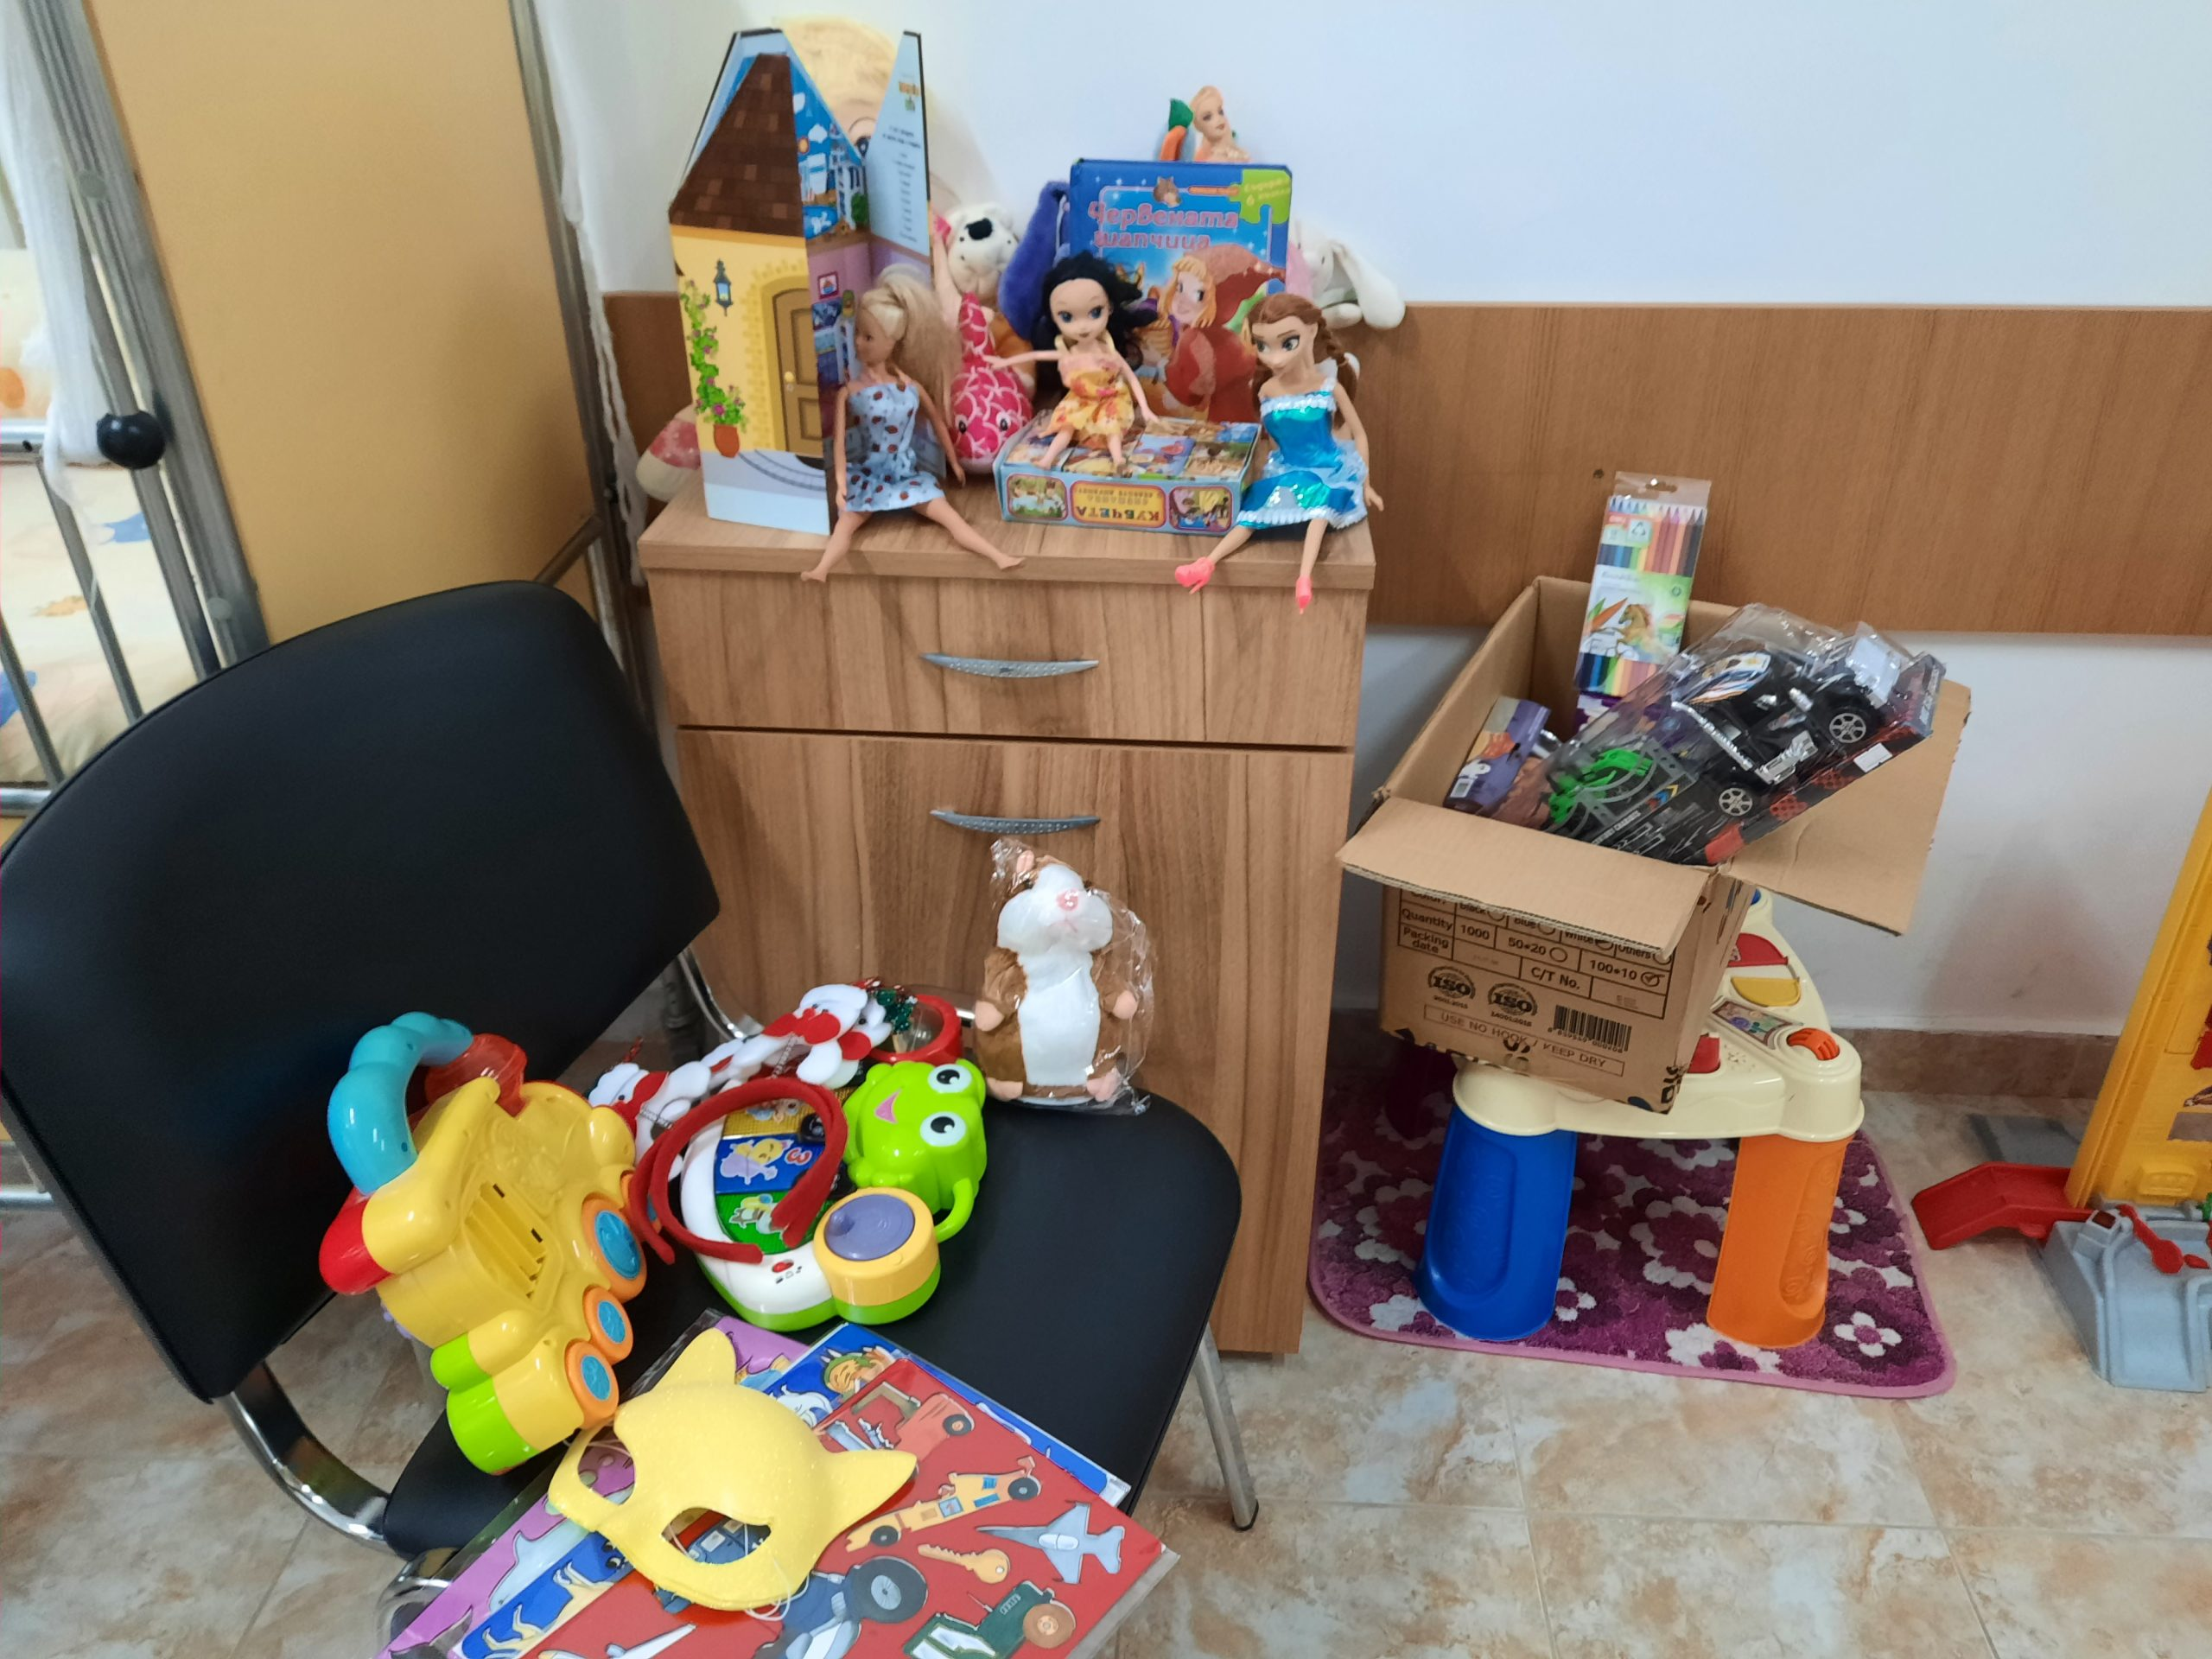 Дарение от детски играчки получи Смолянската болница